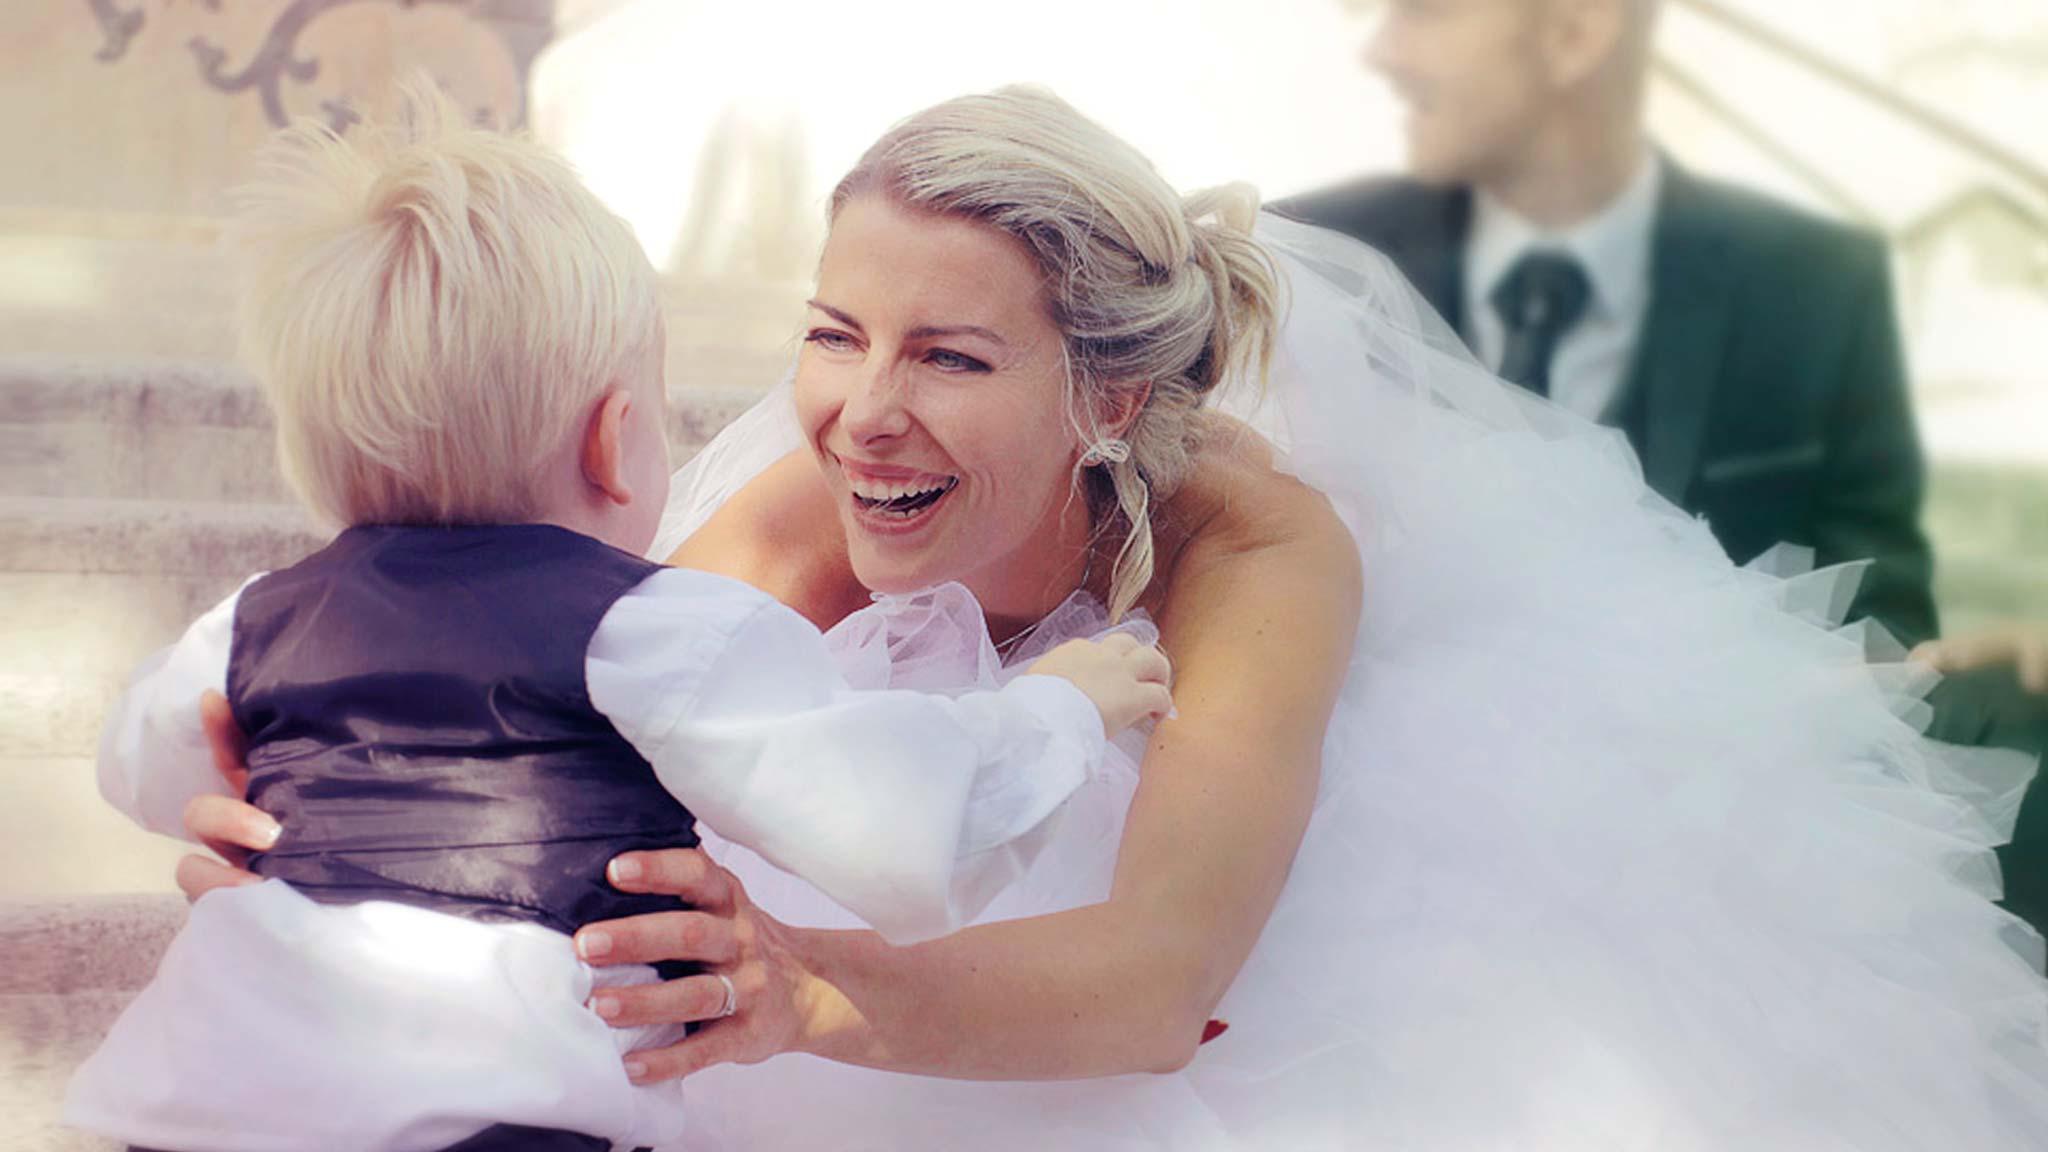 emotion-instant-lifestyle-joie-sourire-bonheur-photographe-mariage-wedding-photographer